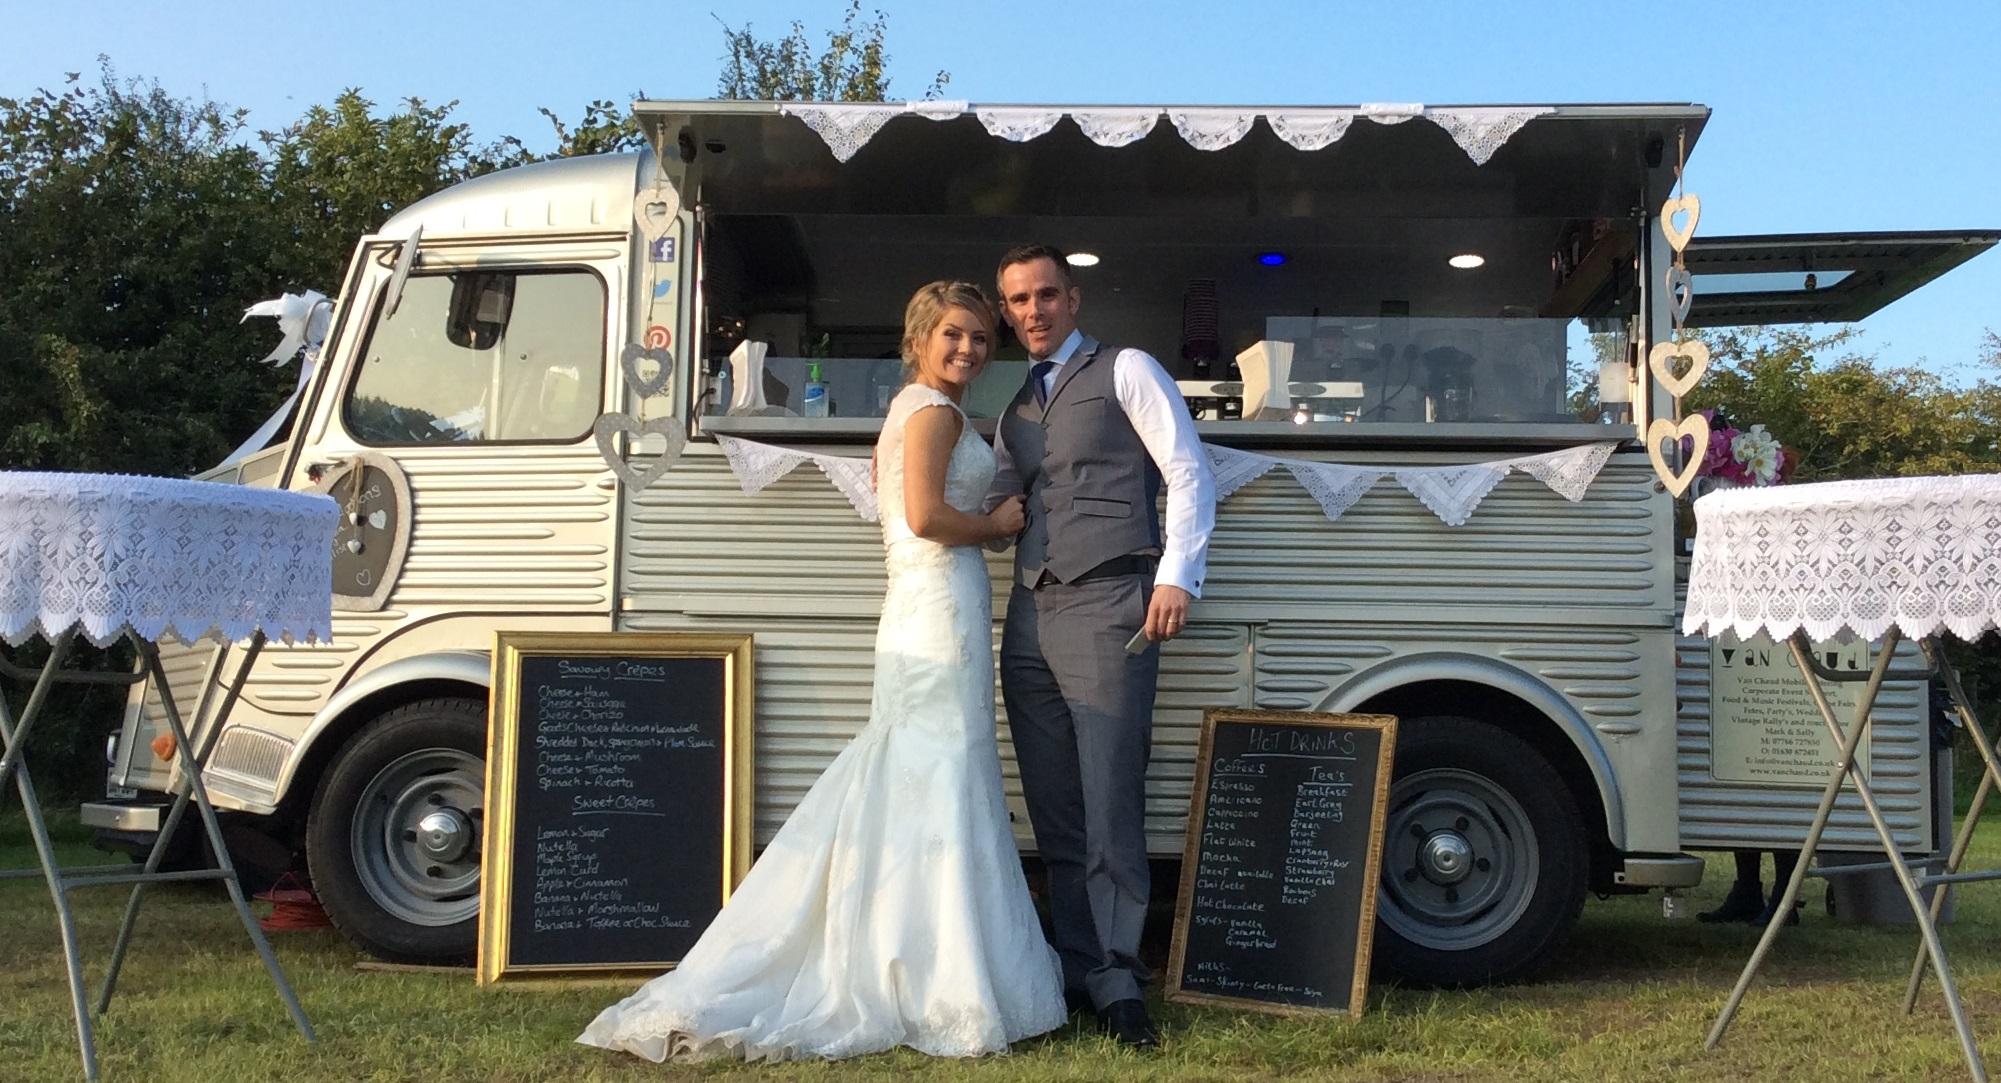 Van Chaud at Hafod Farm Weddings in Snowdonia